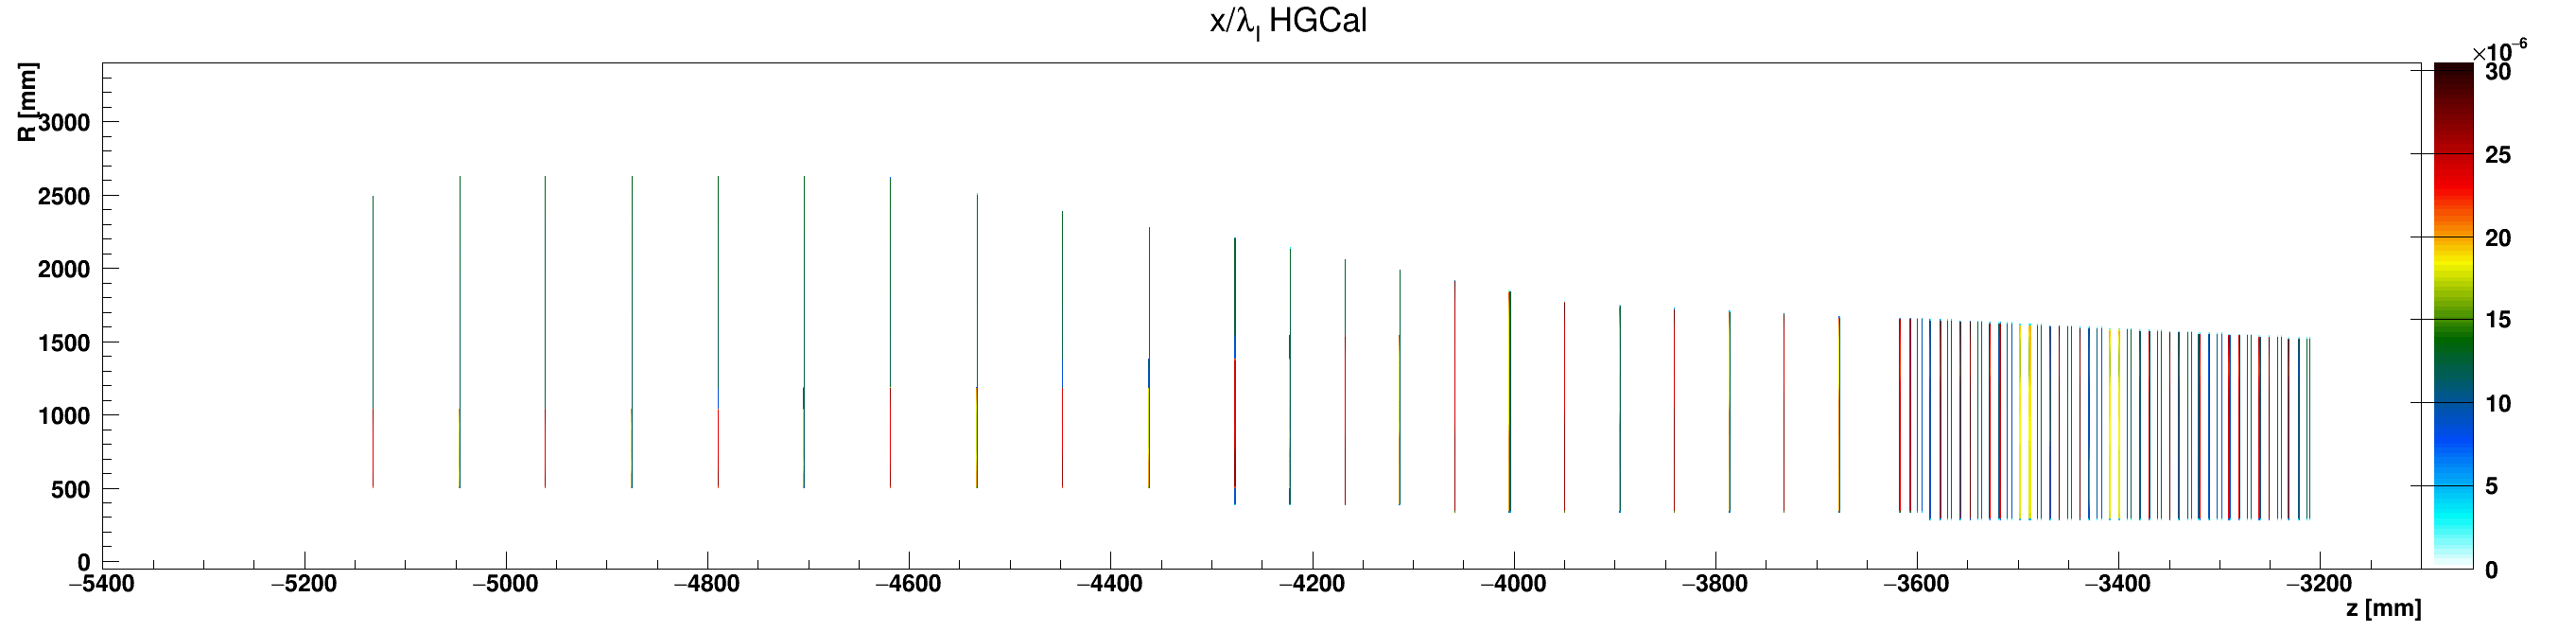 HGCal_l_vs_z_vs_RlocEpoxy_ZminusZoom.png